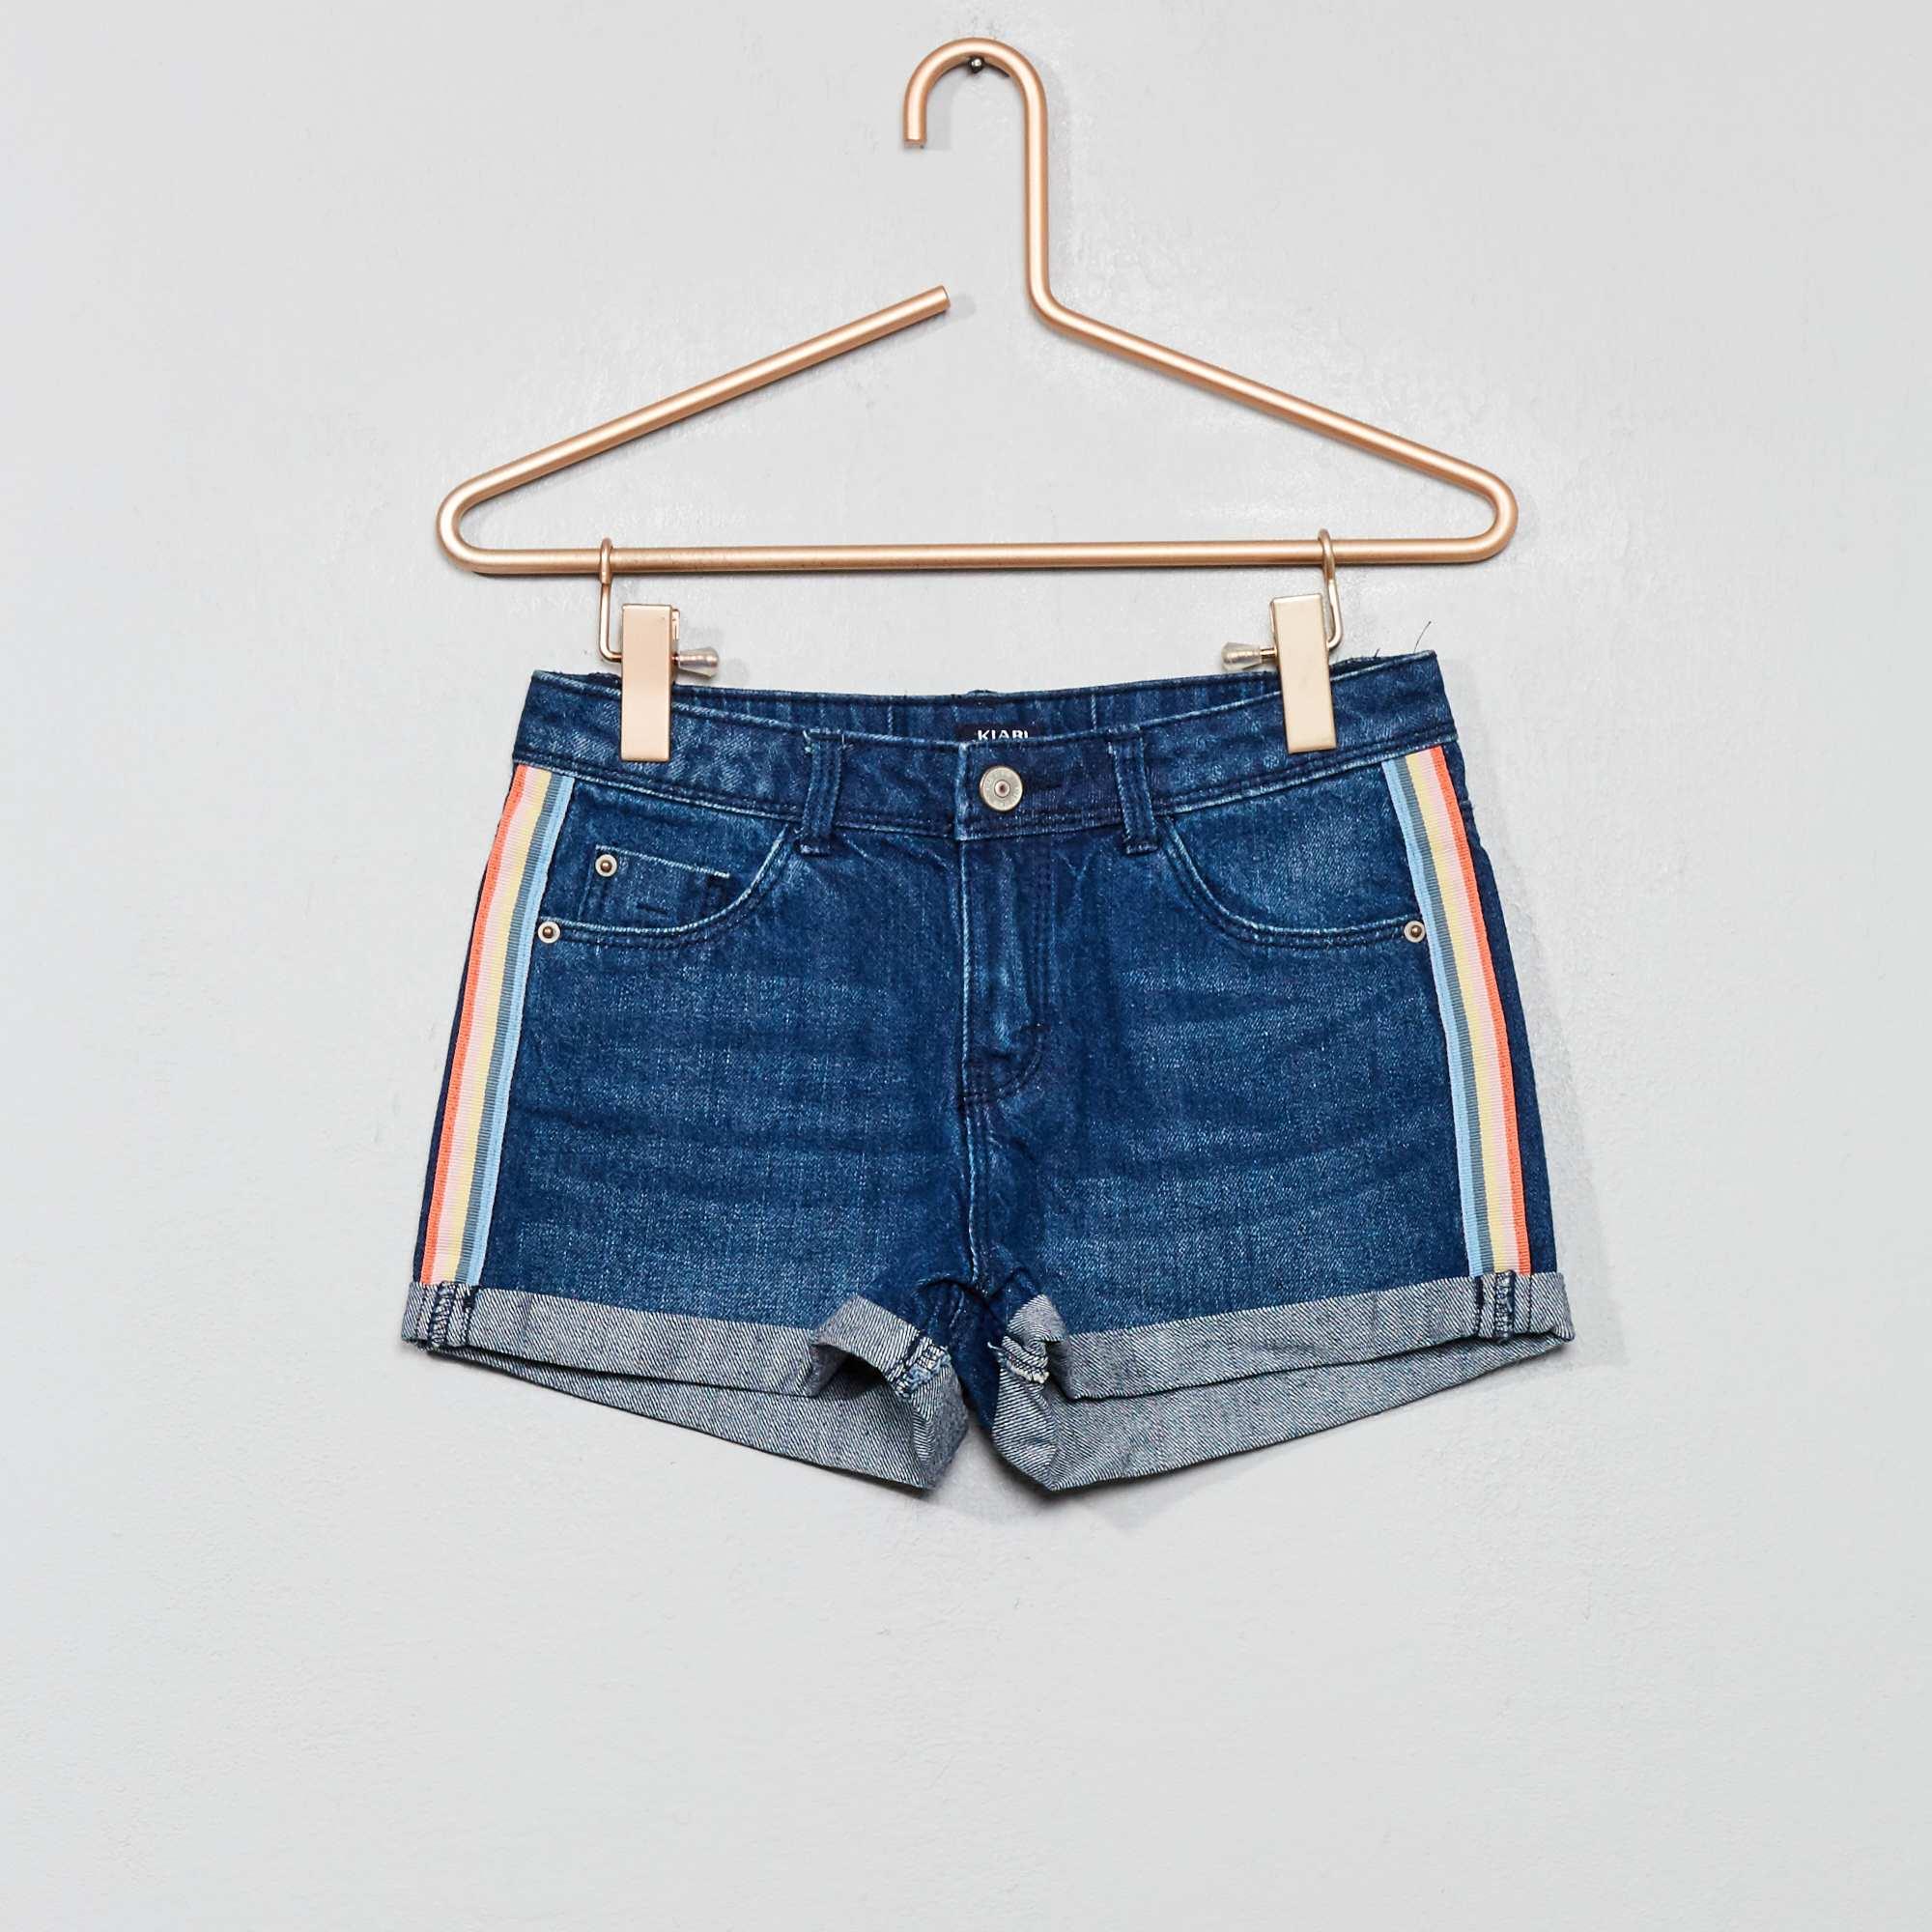 9dee53a0d1e57 Short en jean à bandes Fille - bleu foncé - Kiabi - 10,00€